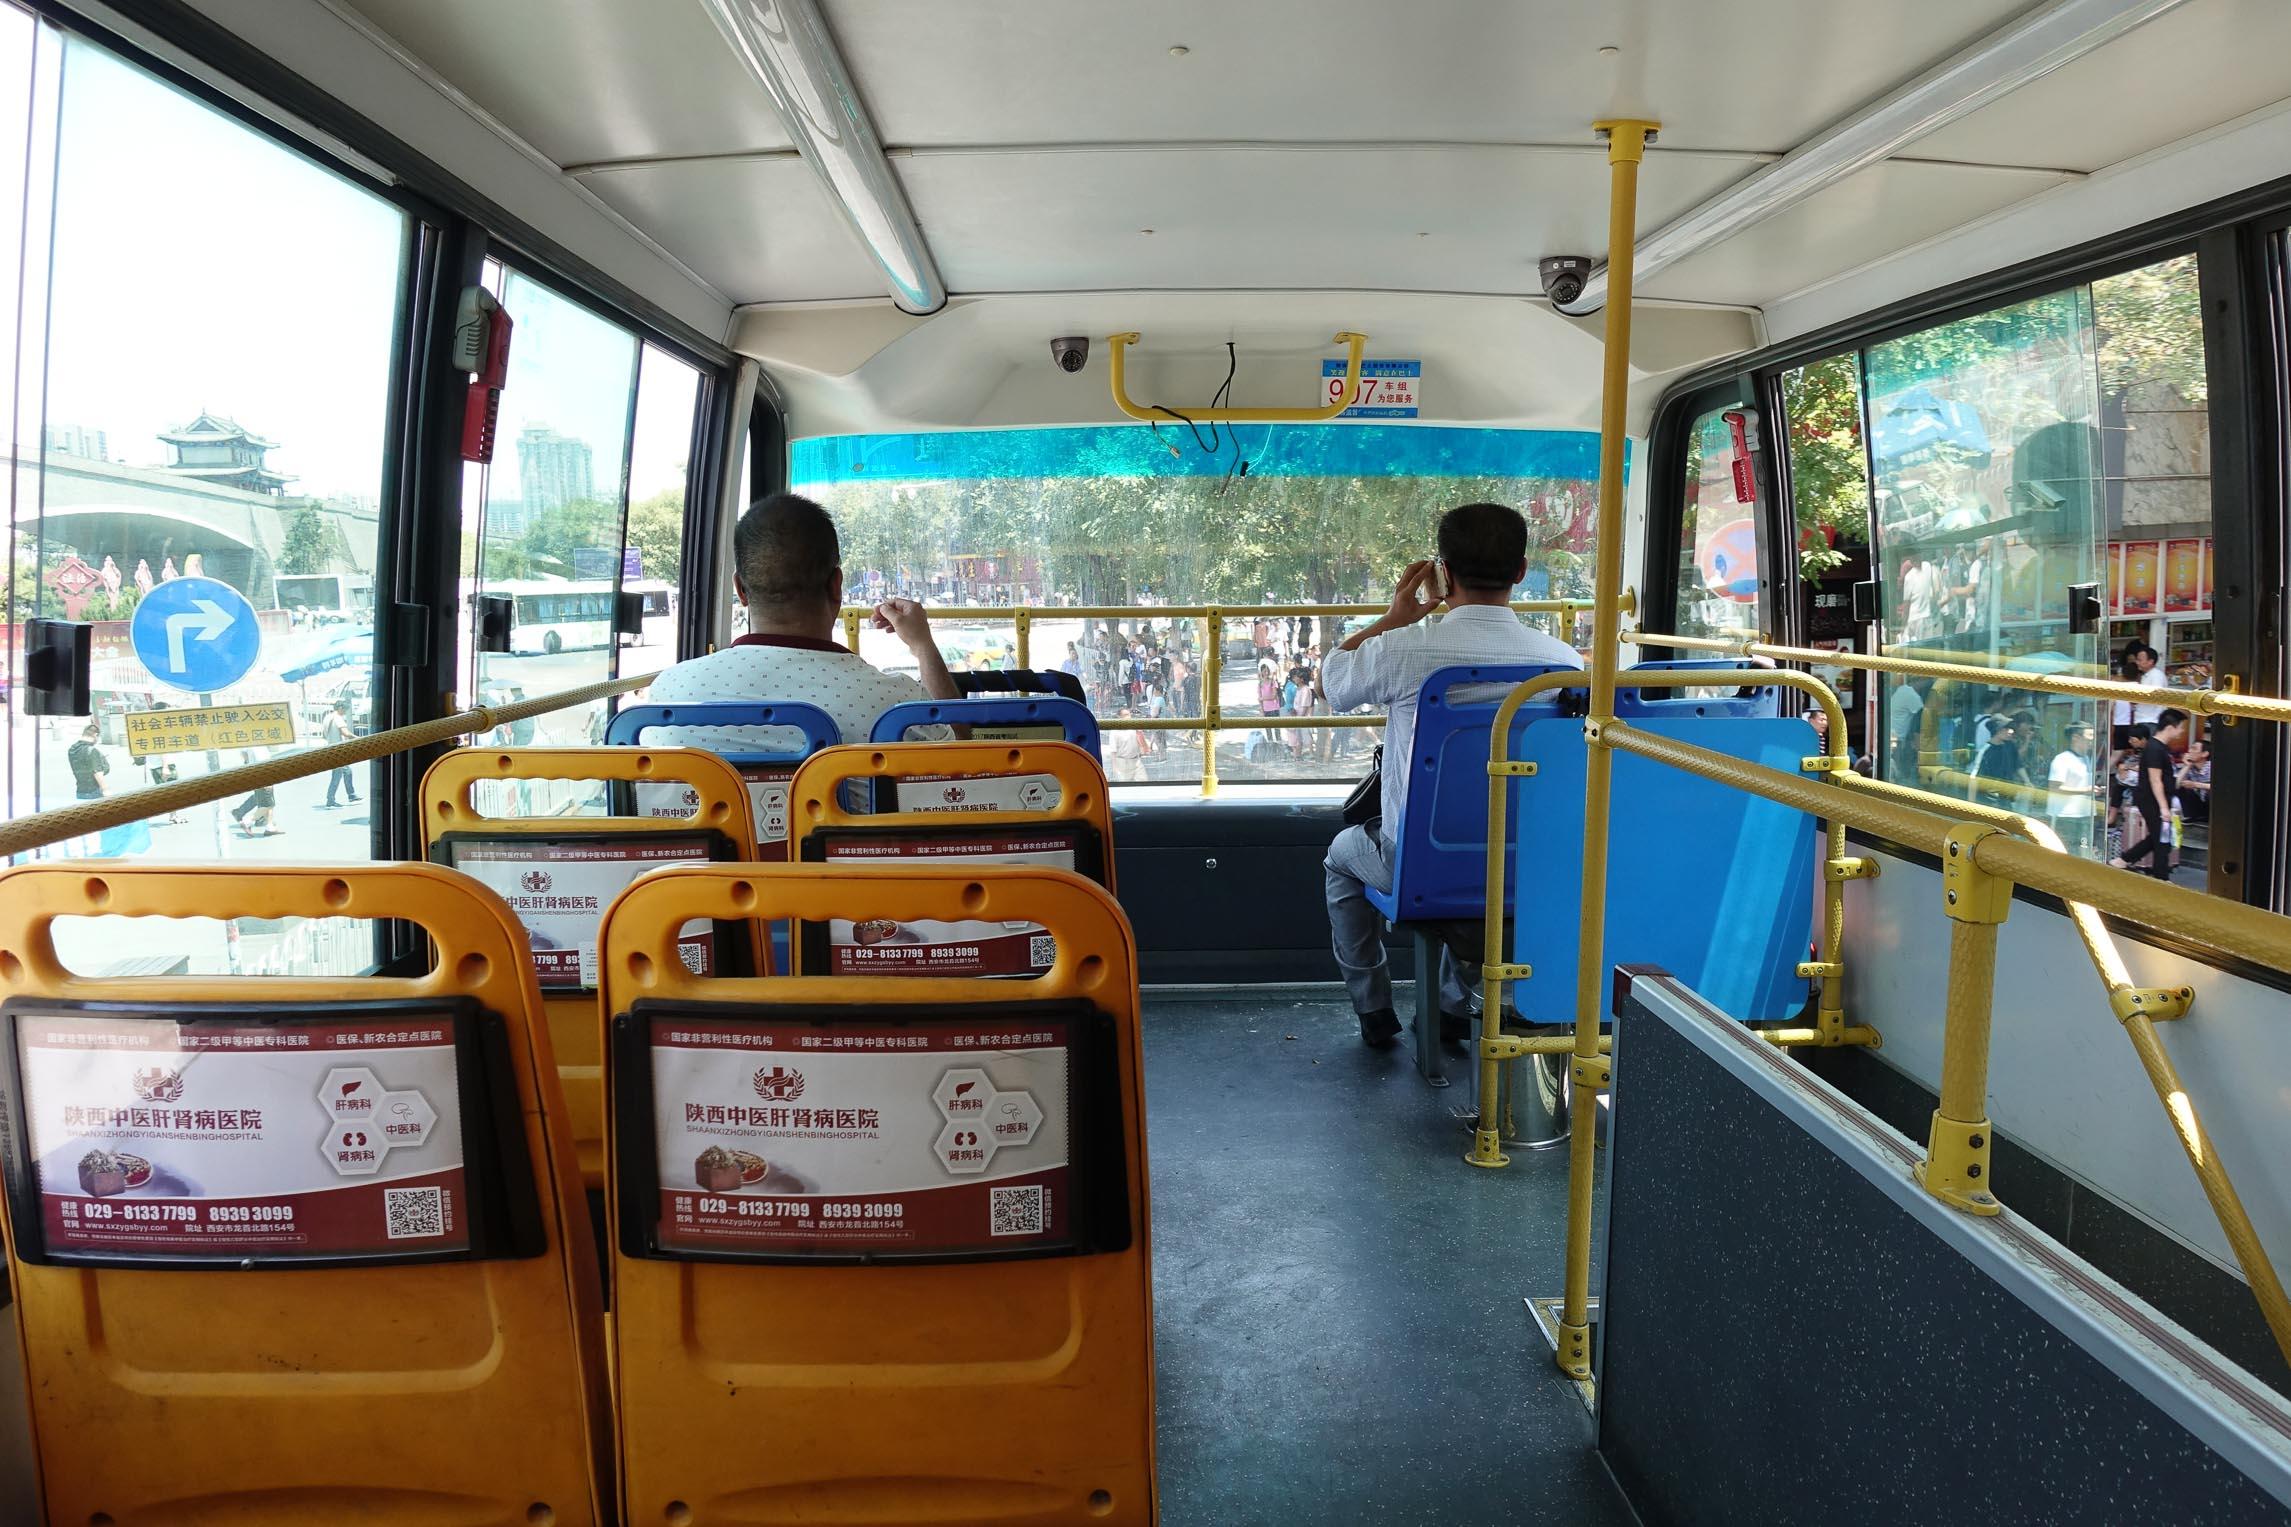 Double decker bus in Xi'an